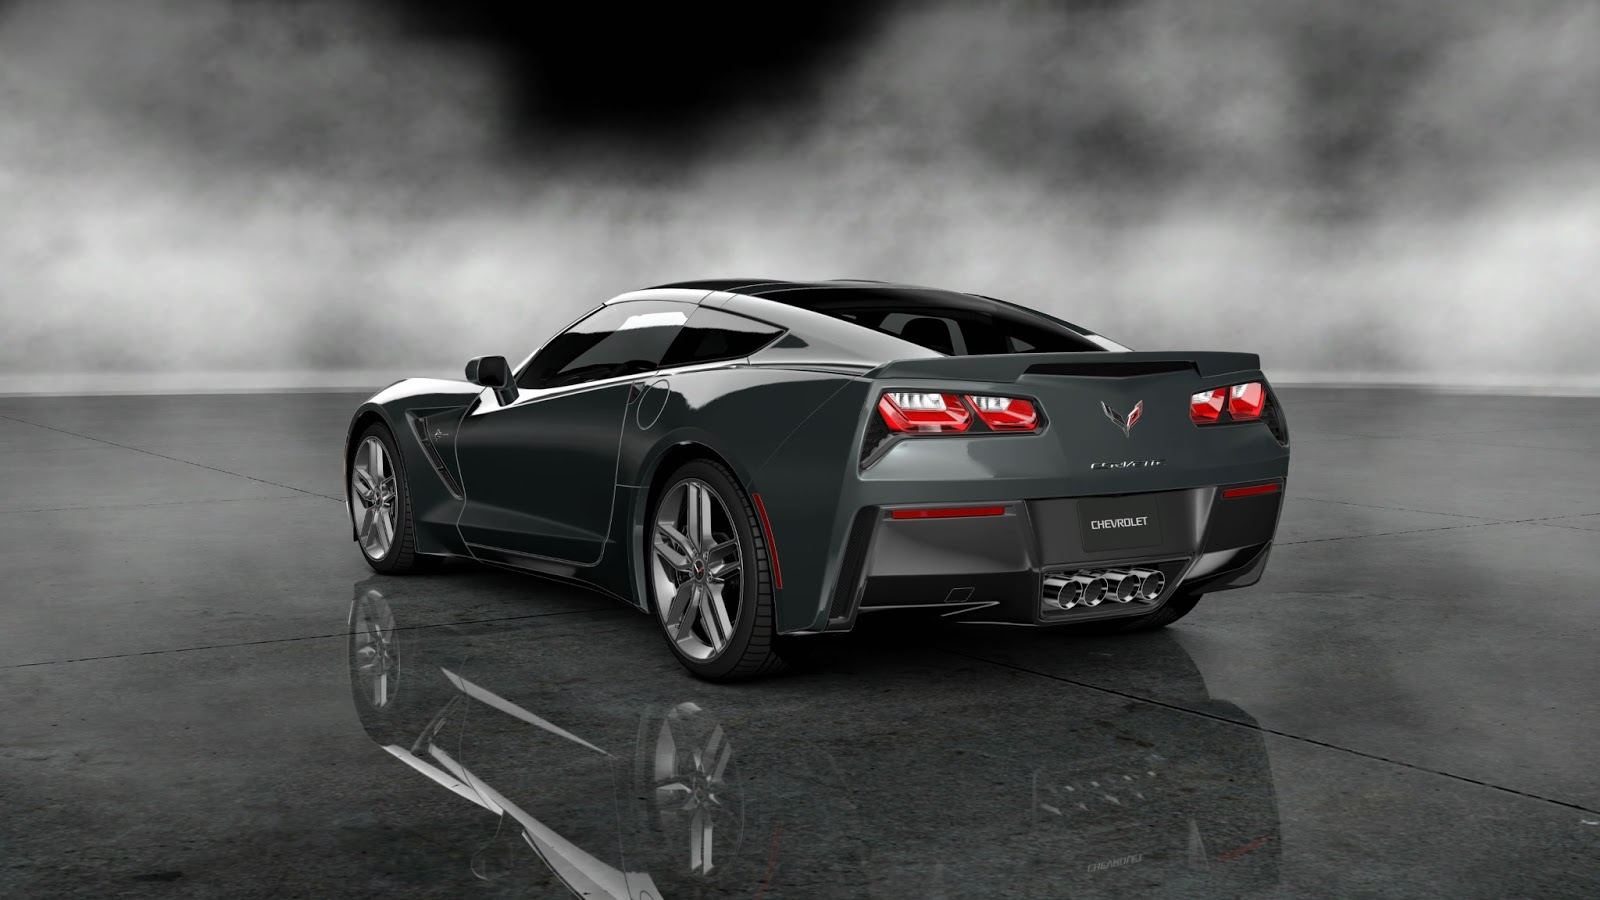 2014 Corvette black